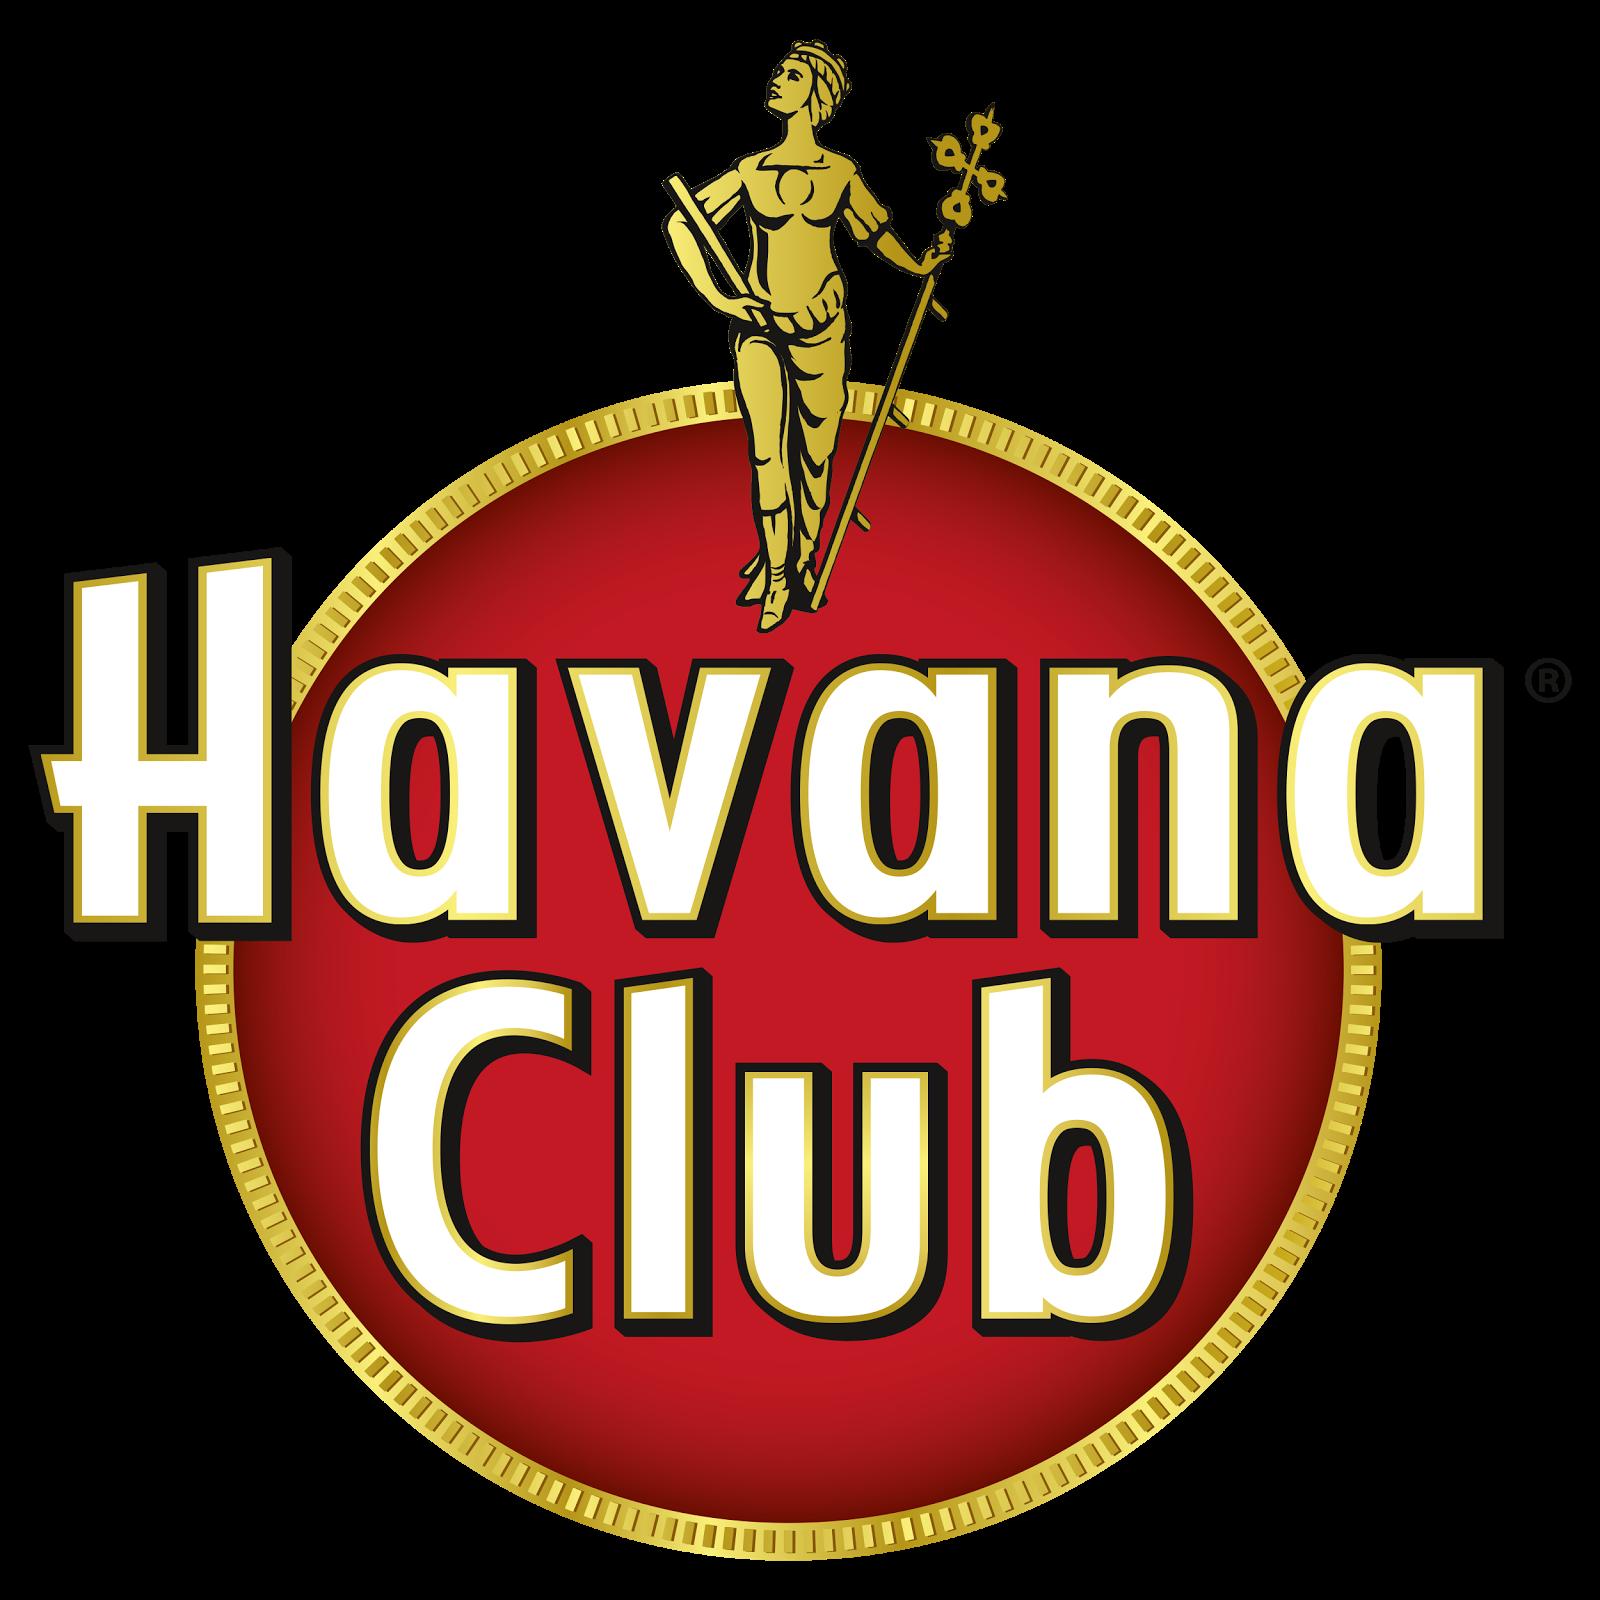 Havana Club präsentiert #spontanero - Wie spontan bist Du ?! ( Witziges sponsored Video und Gewinnspieltipp )